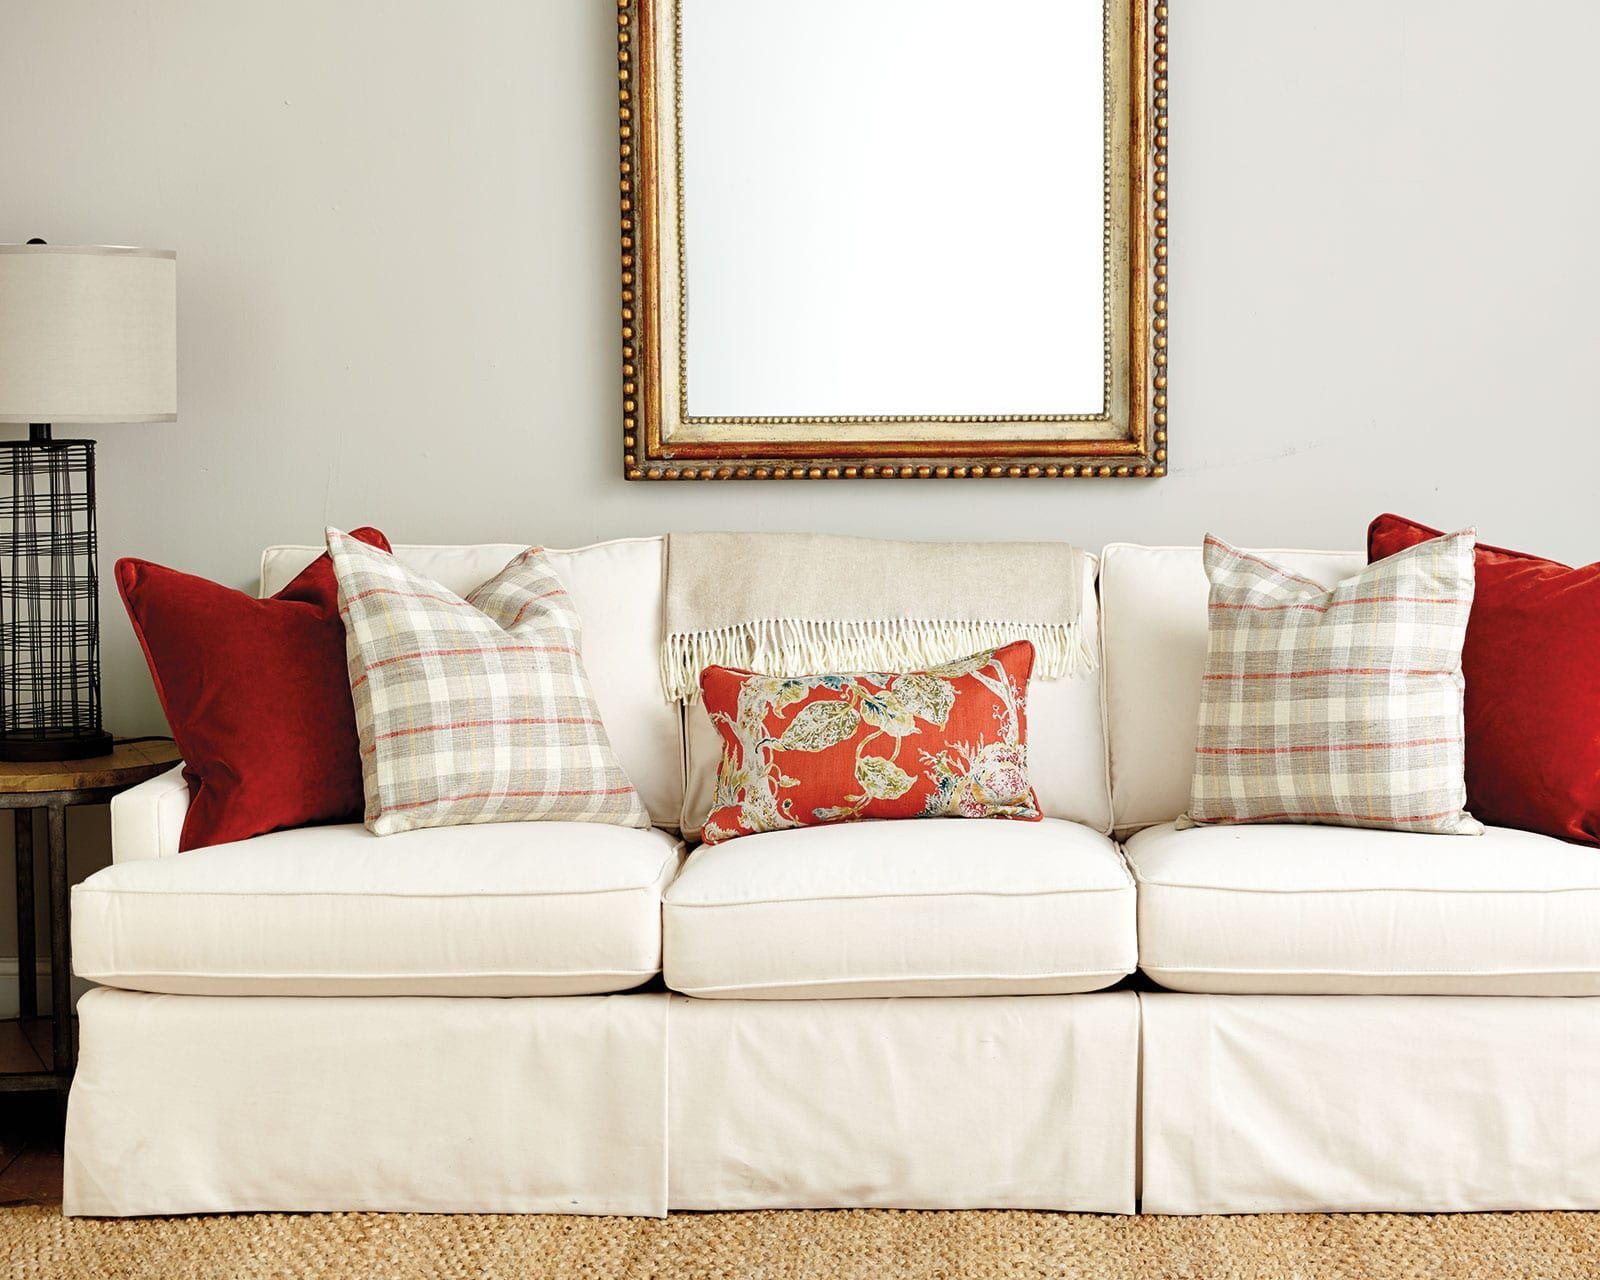 Guide To Choosing Throw Pillows Orange Throw Pillows Living